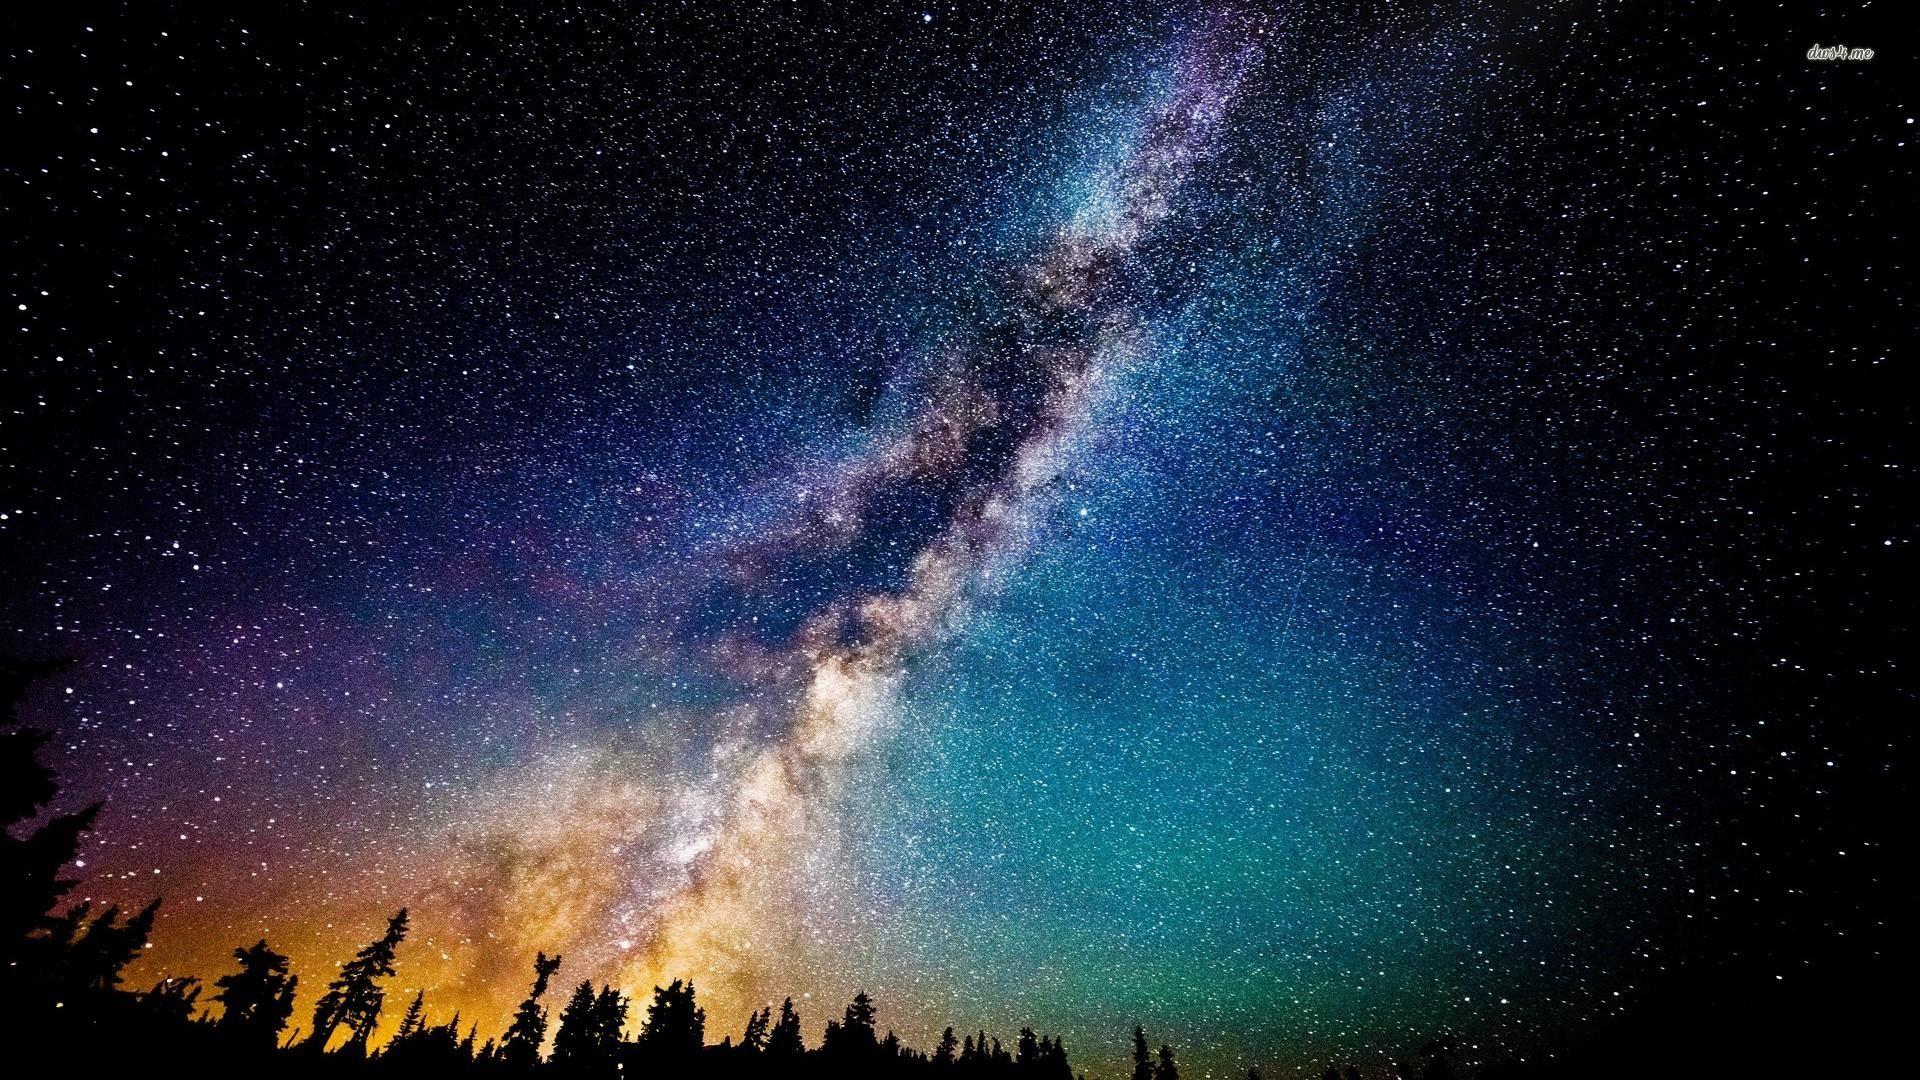 5. galaxy-space-wallpaper-HD5-600×338